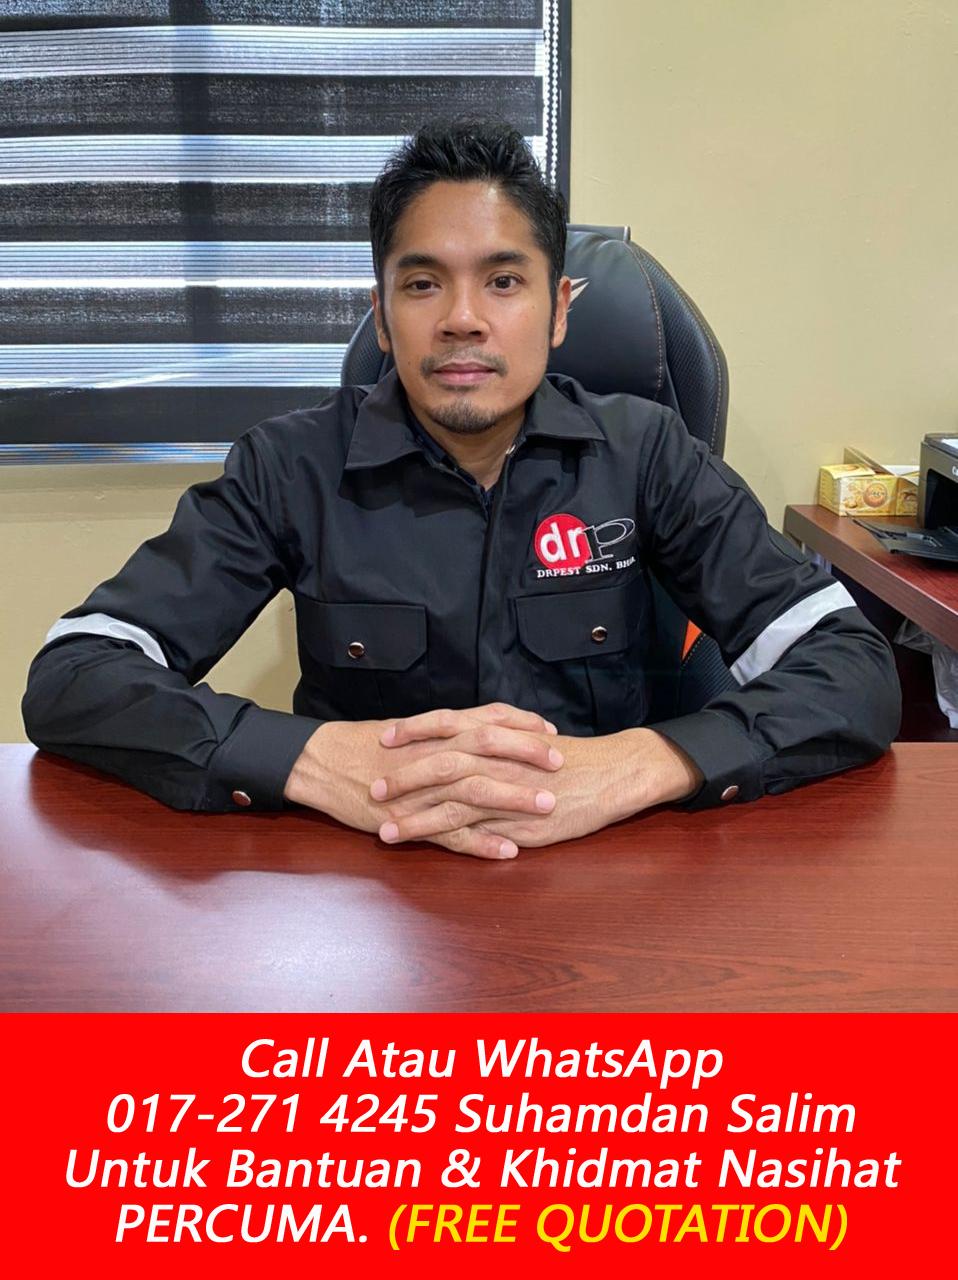 drpest sdn bhd drp maintenance and services syarikat kawalan serangga bumiputra yang berlesen the best company pest control near me area Bukit Jalil kl near me